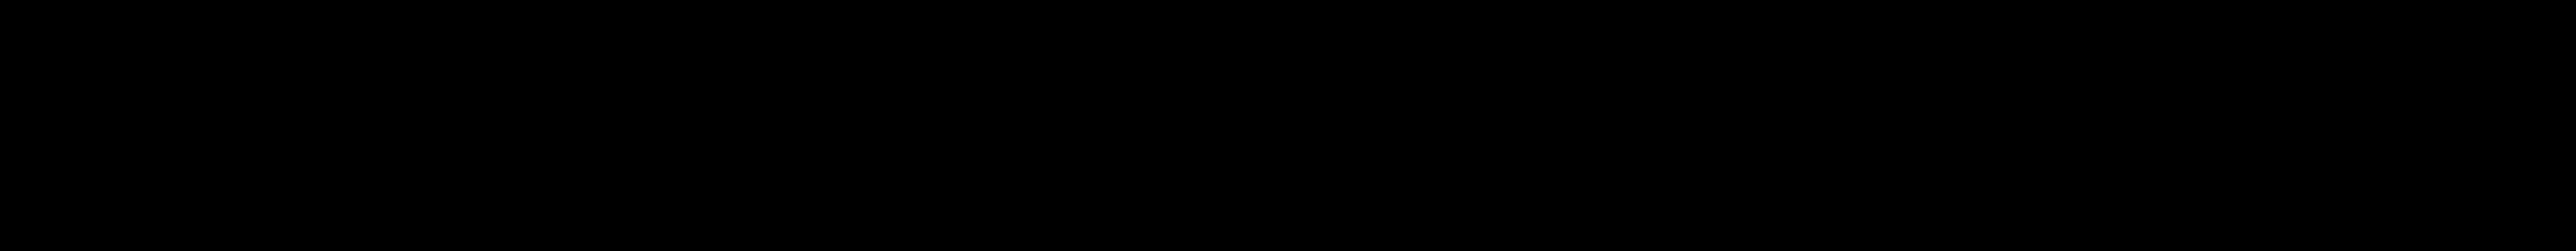 Logo Aidshilfe Ahlen